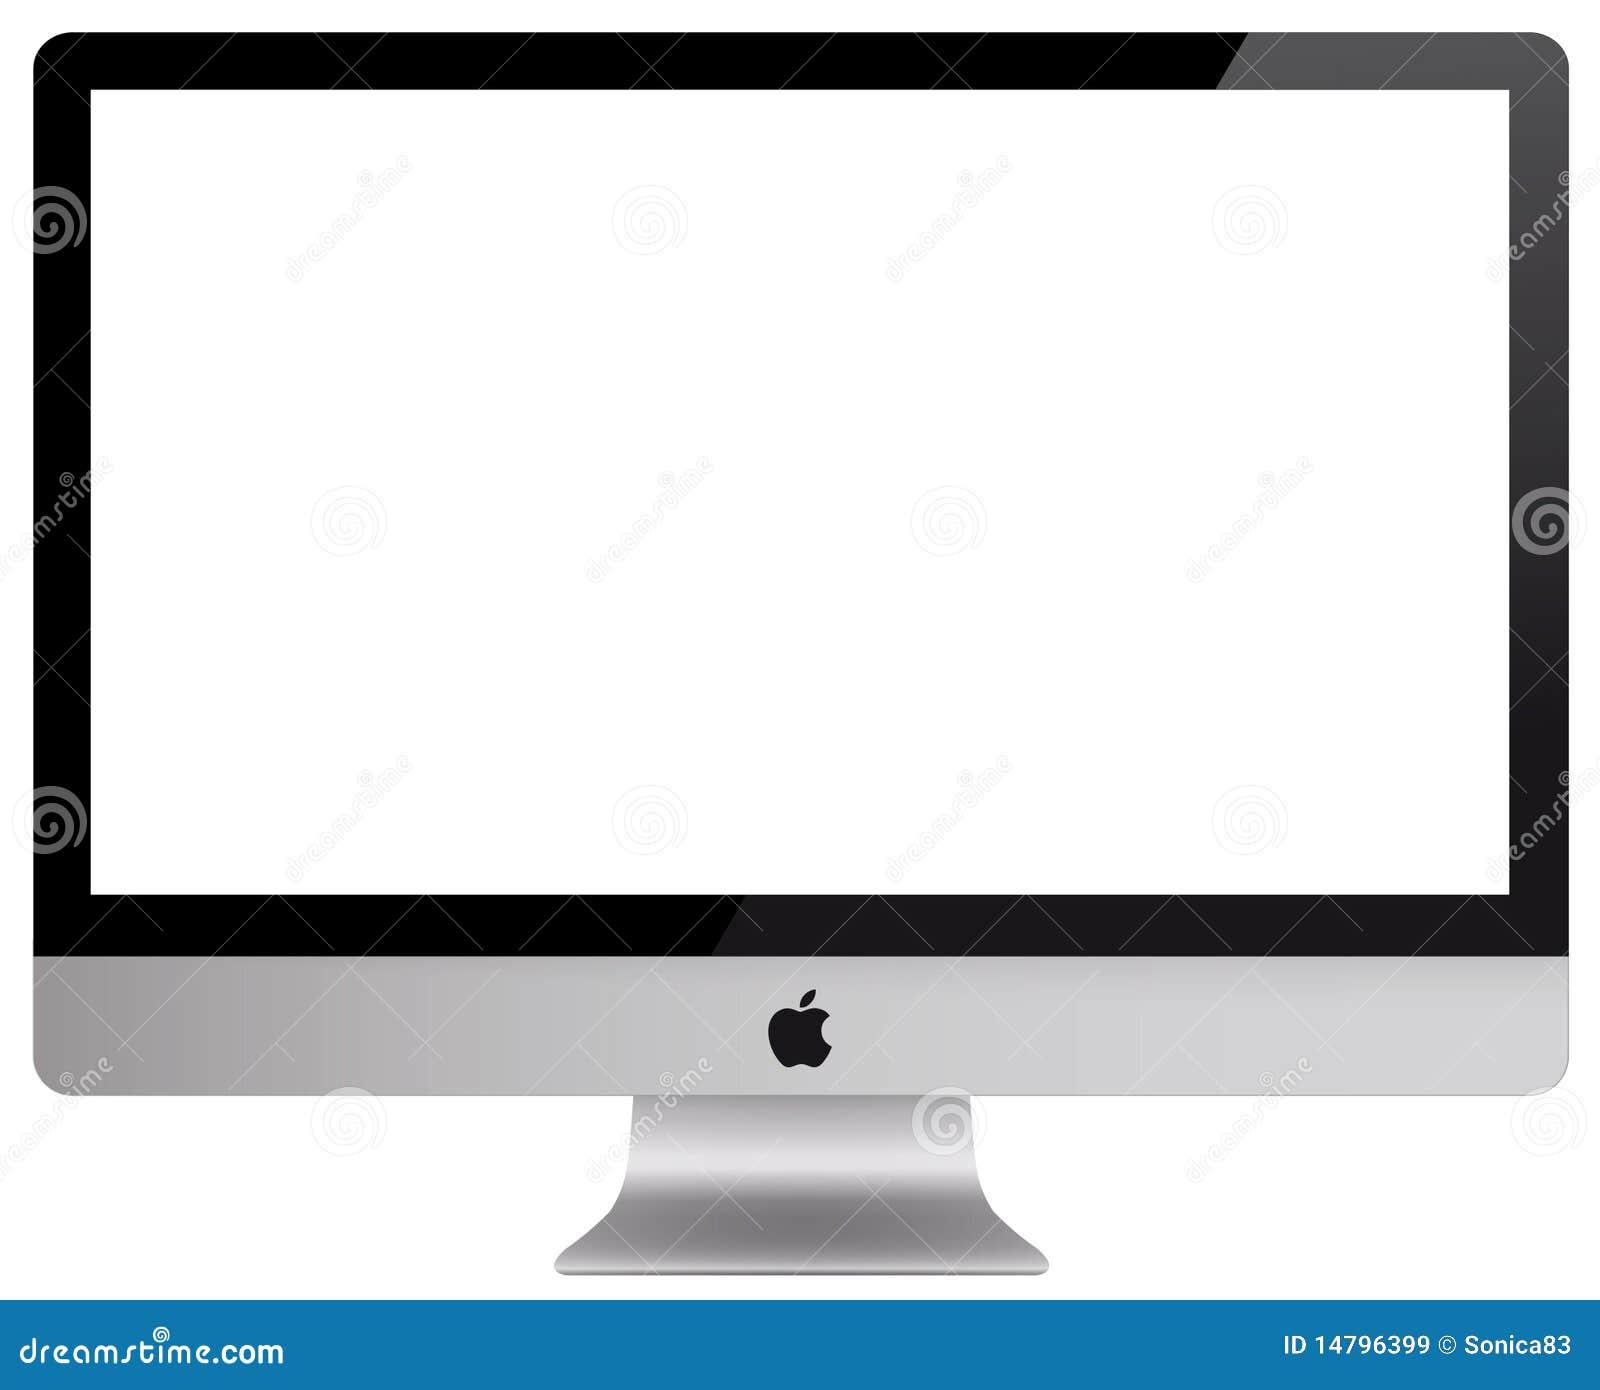 Neues Apple iMac